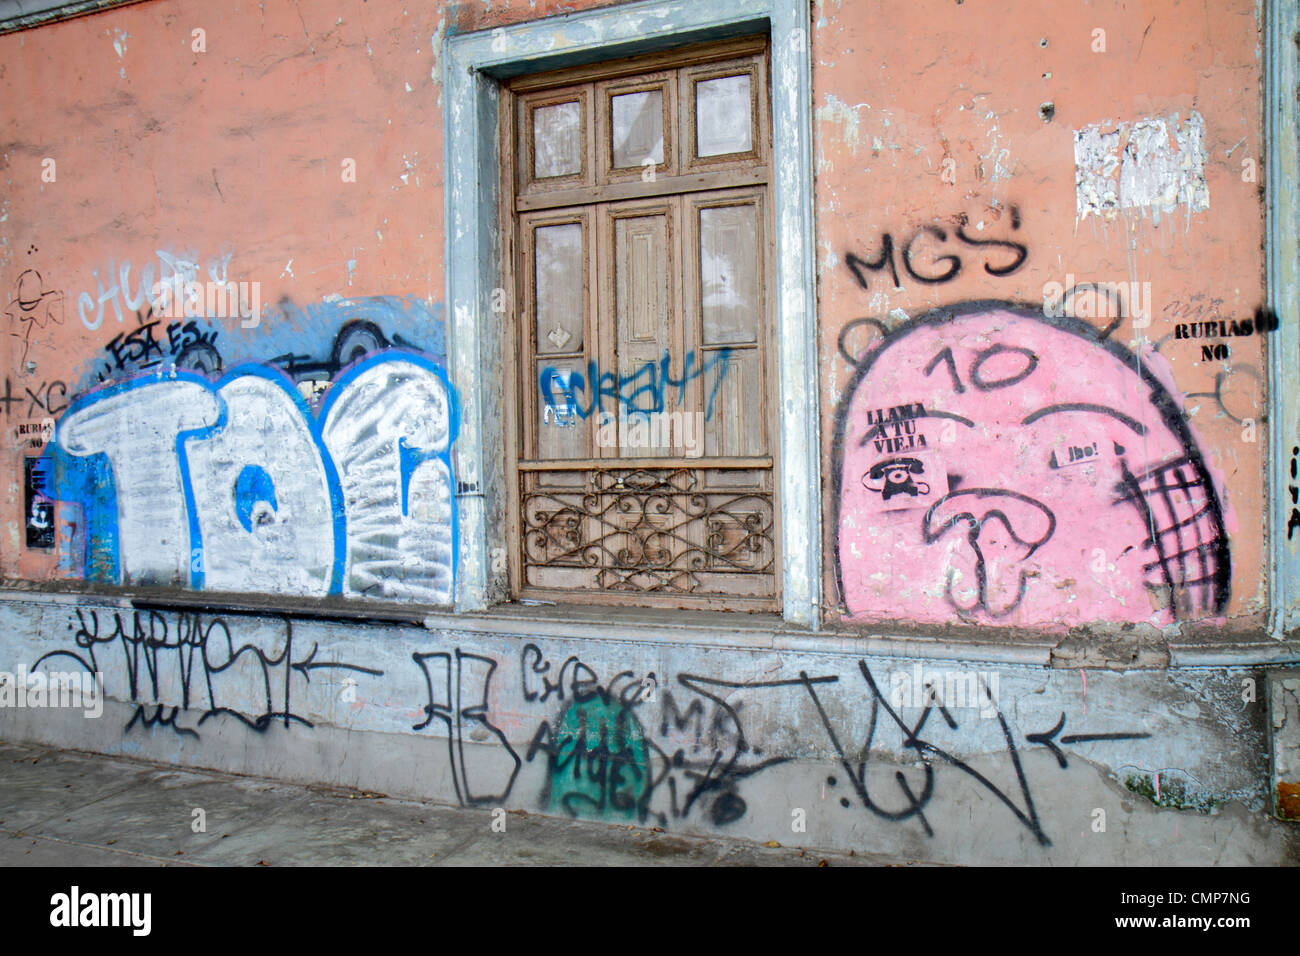 Lima Peru Barranco Bezirk Avenida Pedro D'Osma Bürgersteig Außenfenster Graffiti Vandalismus städtische Stockbild